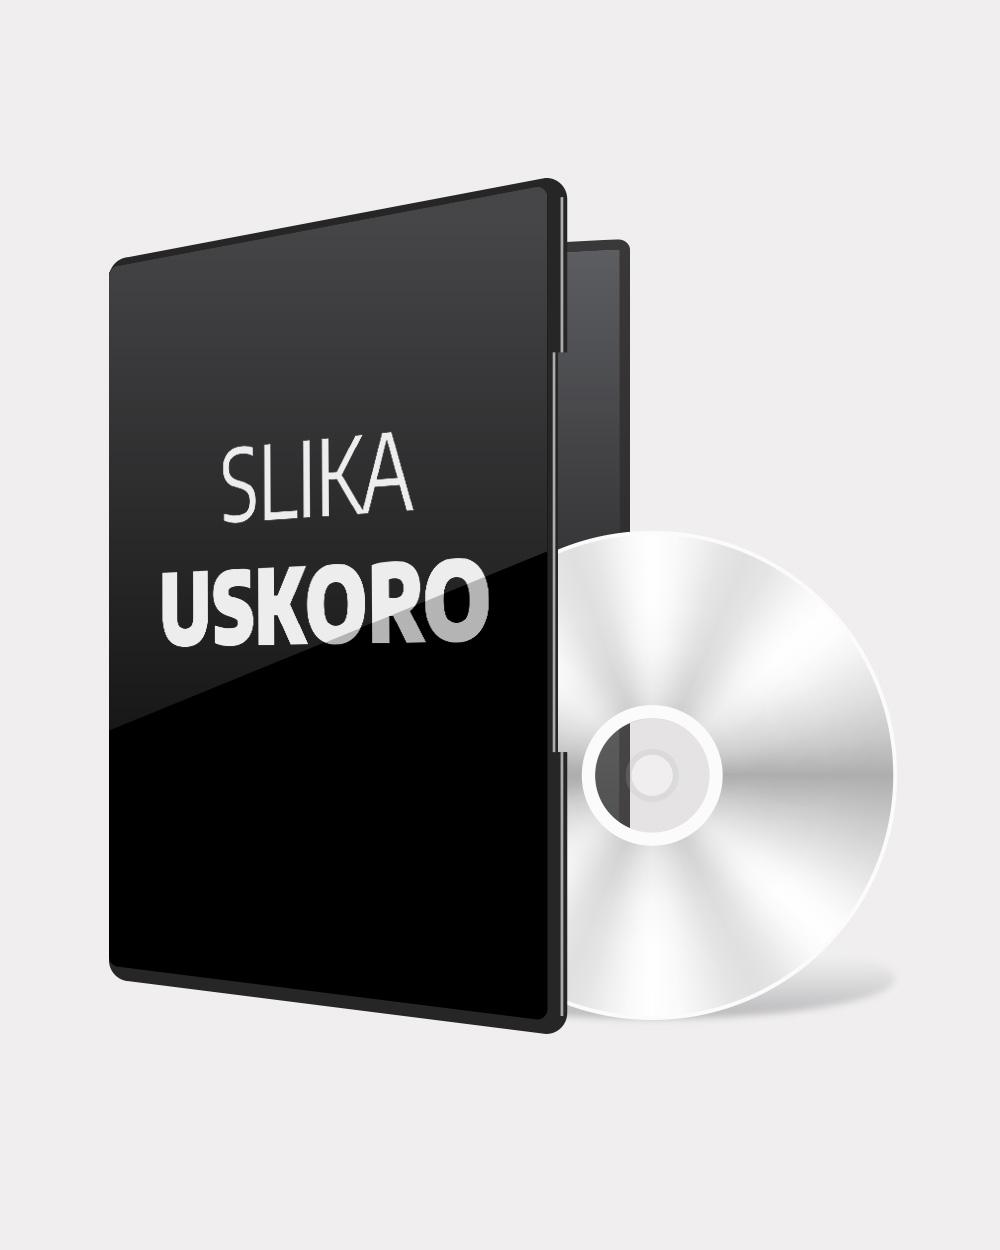 XBOX ONE Pro Evolution Soccer 2015 PES 2015